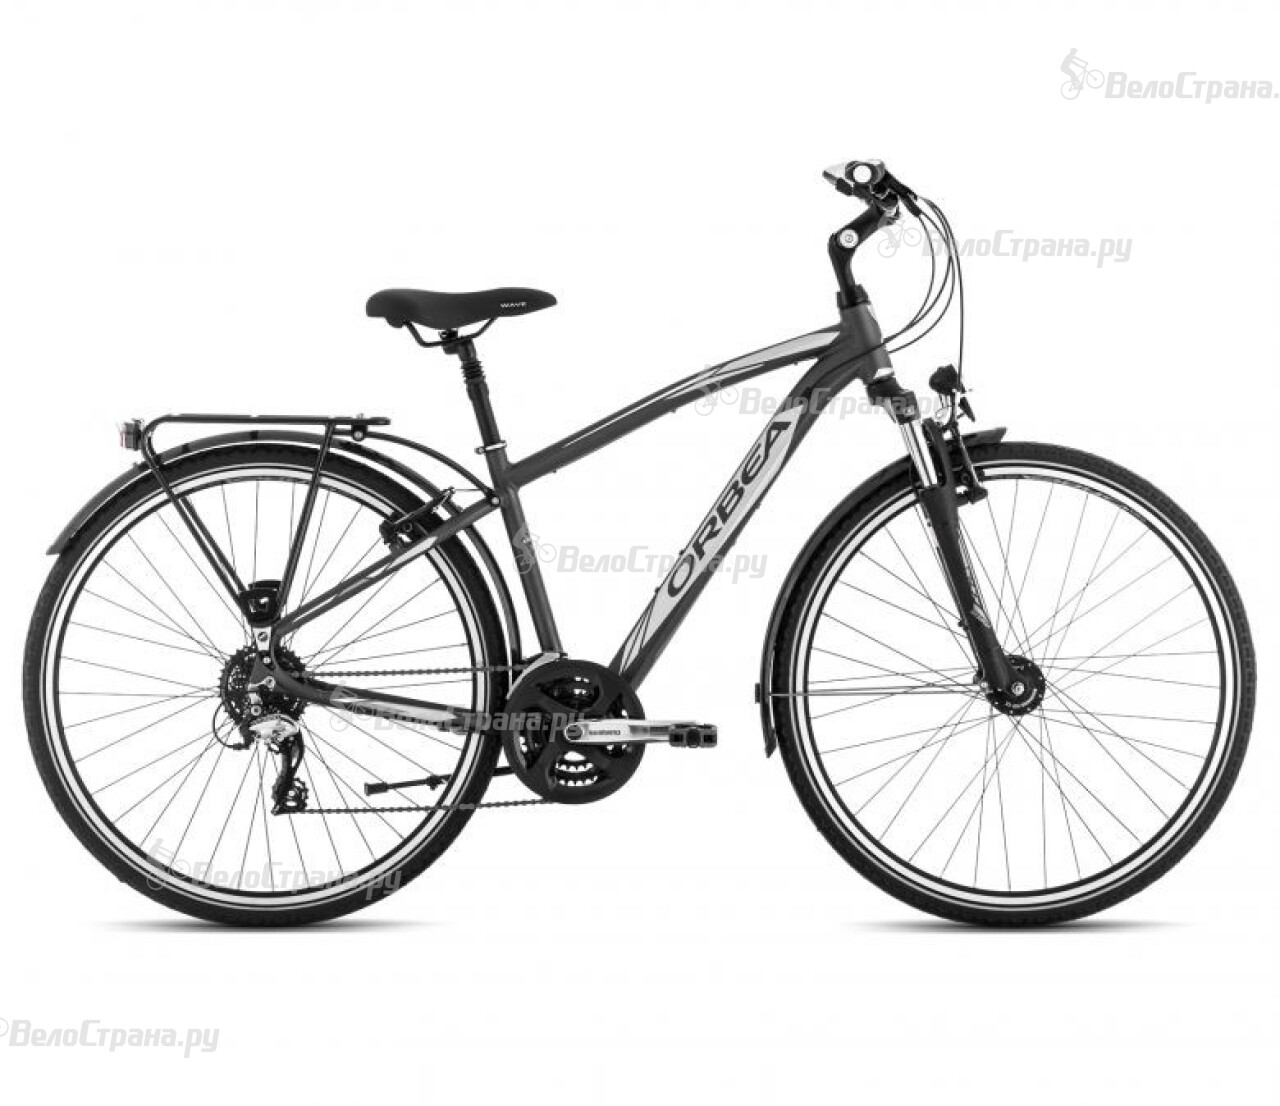 Велосипед Orbea Comfort 28 20 Equipped (2014) палатка greenell моби 3 плюс